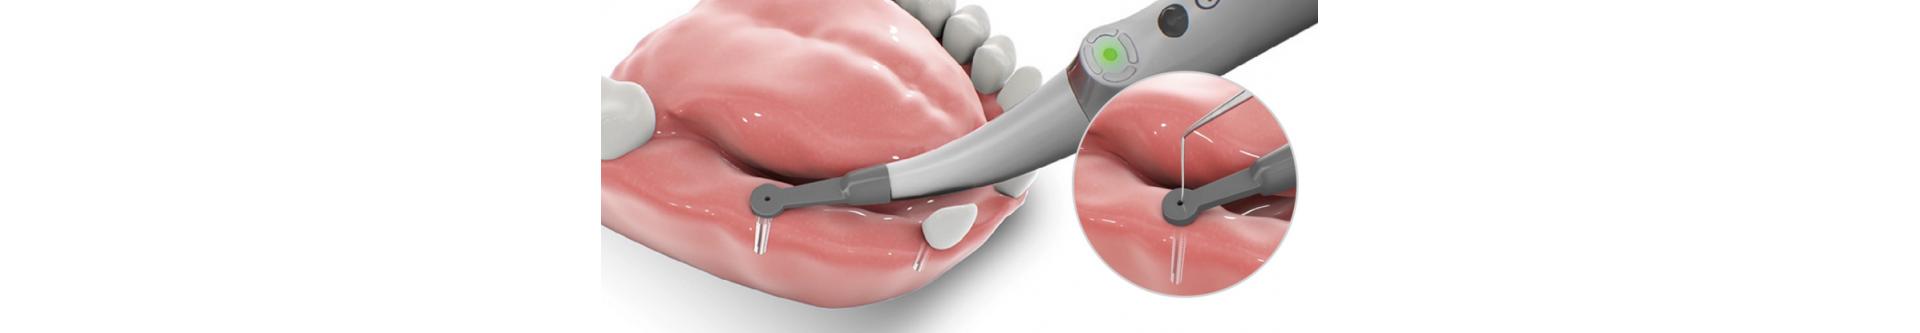 Implant detector